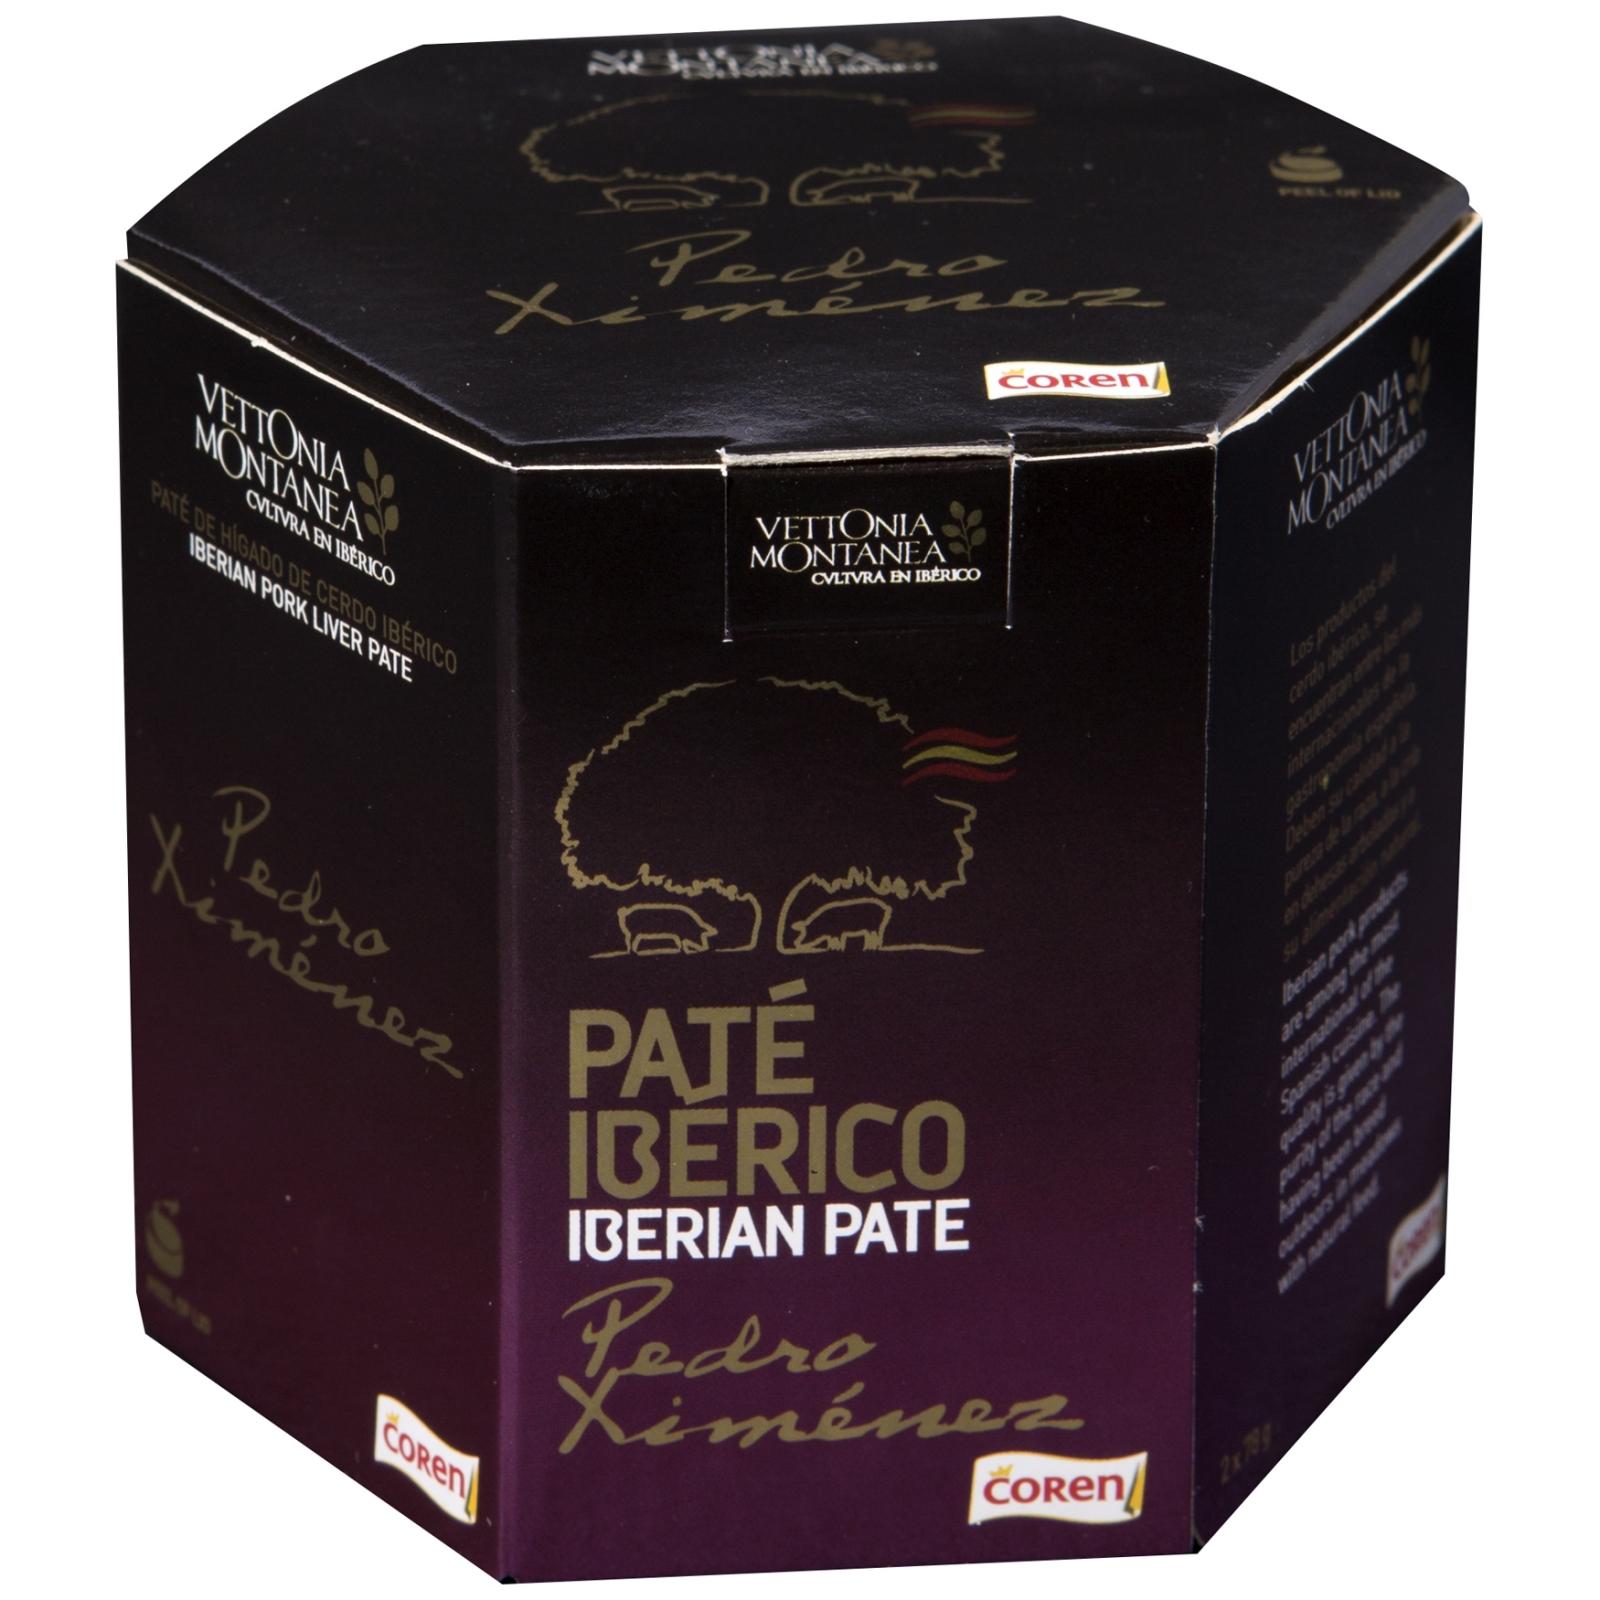 Paté ibérico Pedro Ximenez